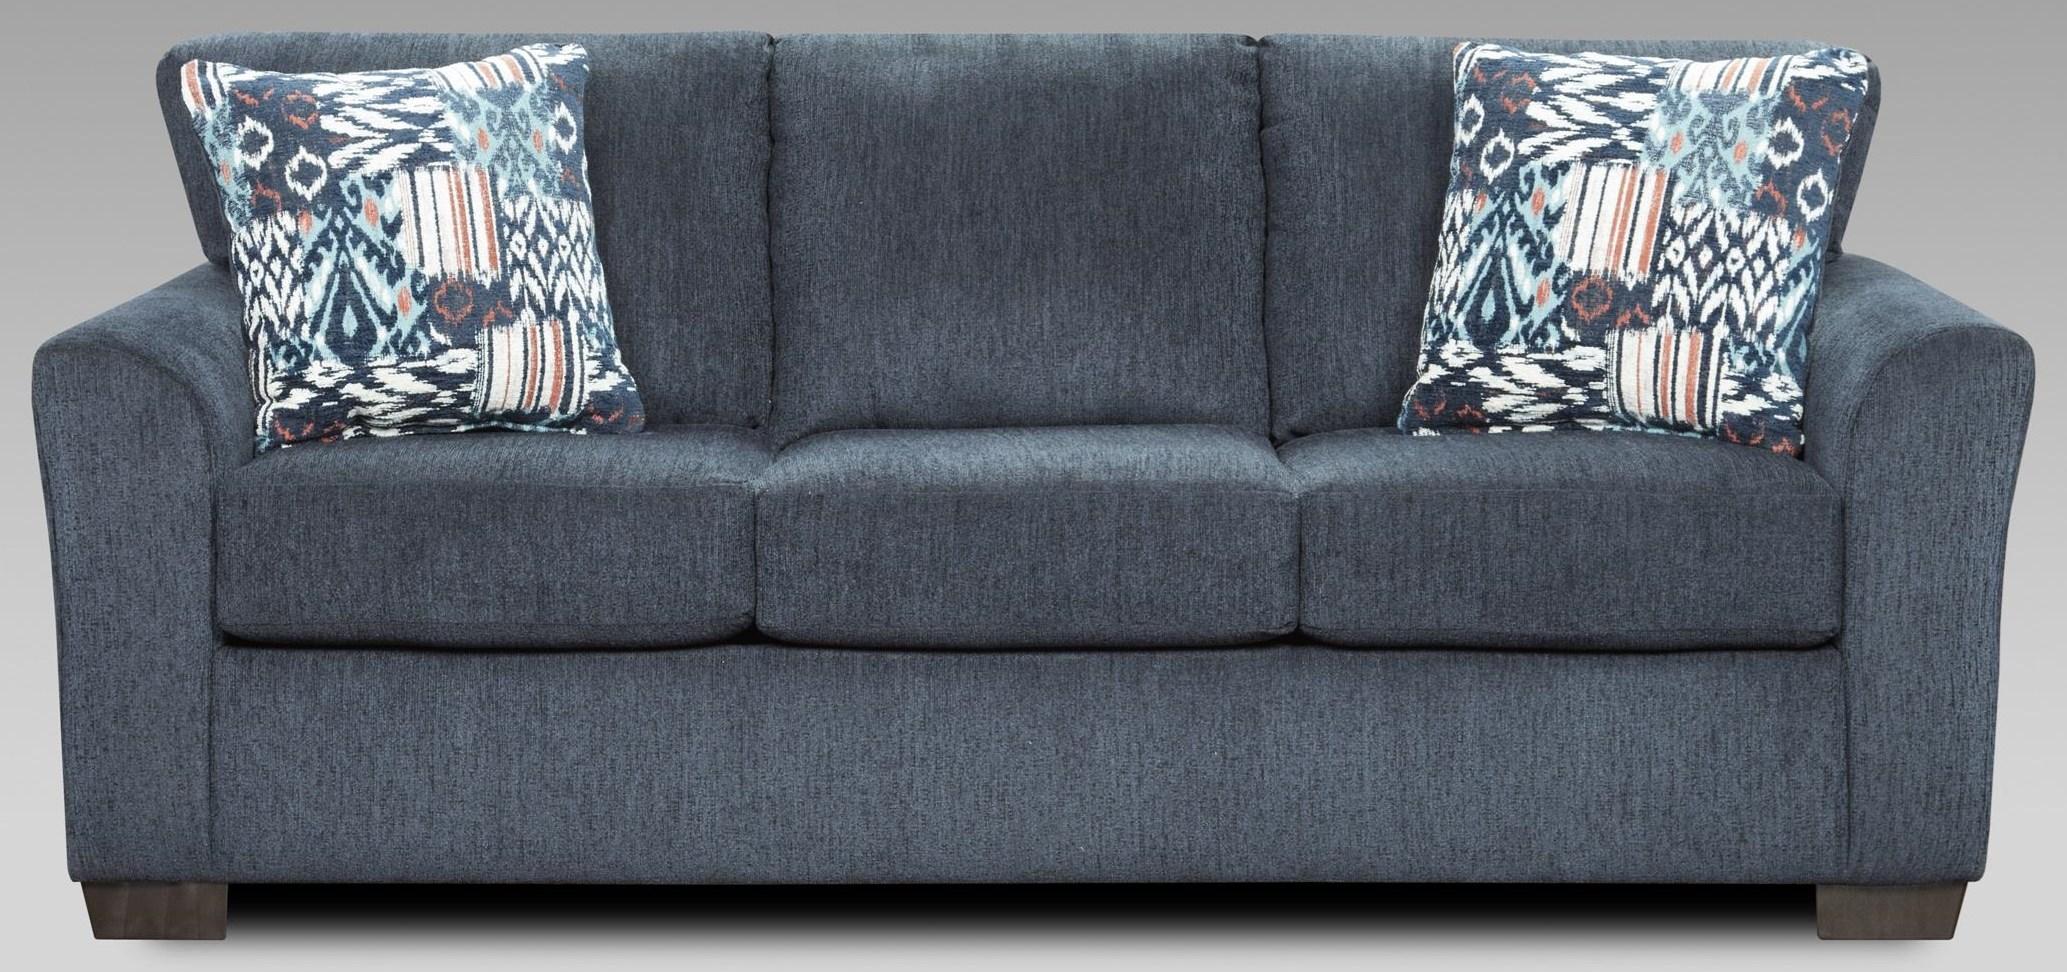 3333 3333 Navy Sleeper Sofa by Affordable Furniture at Furniture Fair - North Carolina